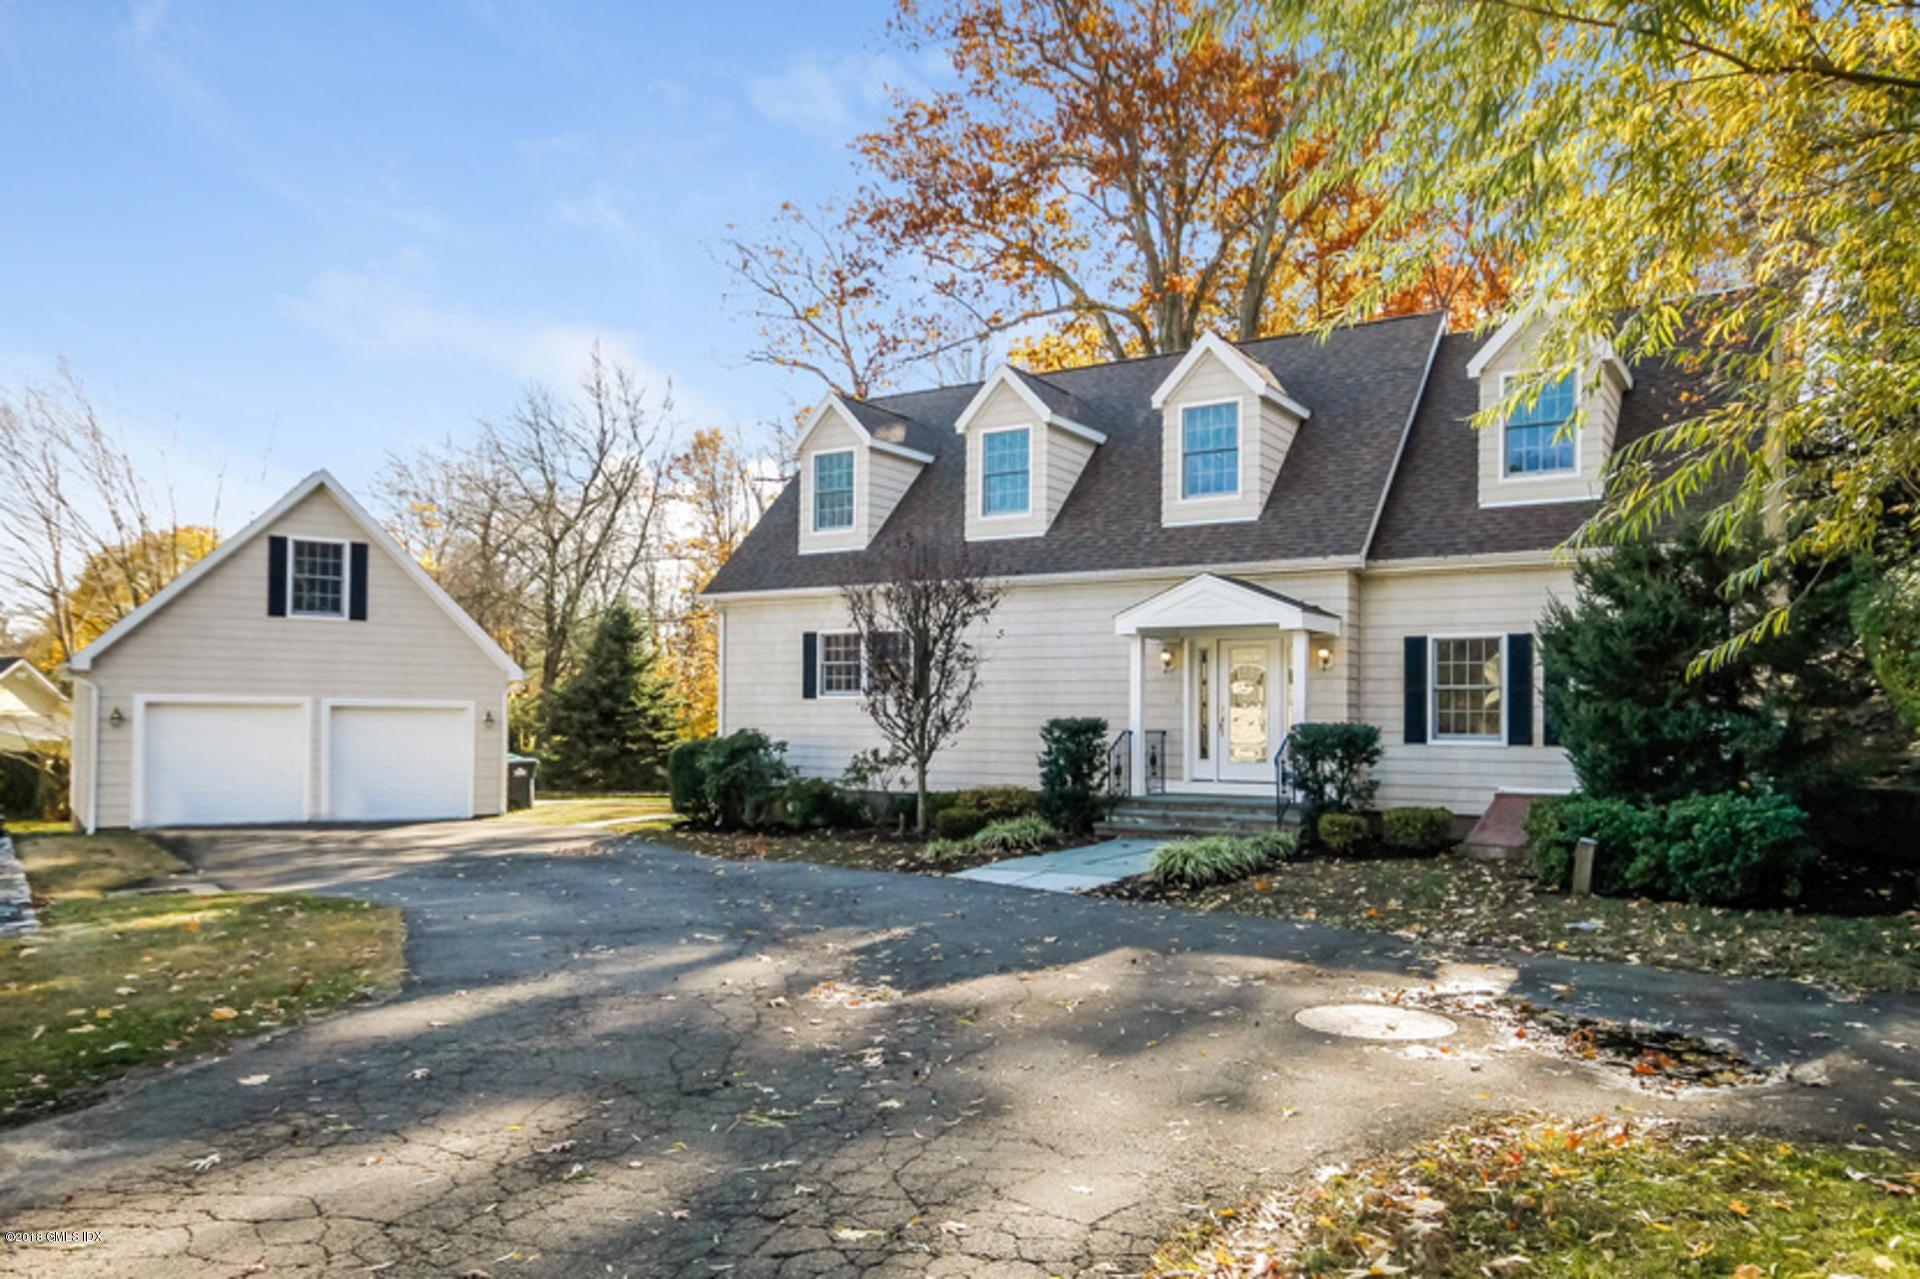 95 Valleywood Road,Cos Cob,Connecticut 06807,3 Bedrooms Bedrooms,4 BathroomsBathrooms,Single family,Valleywood,104960